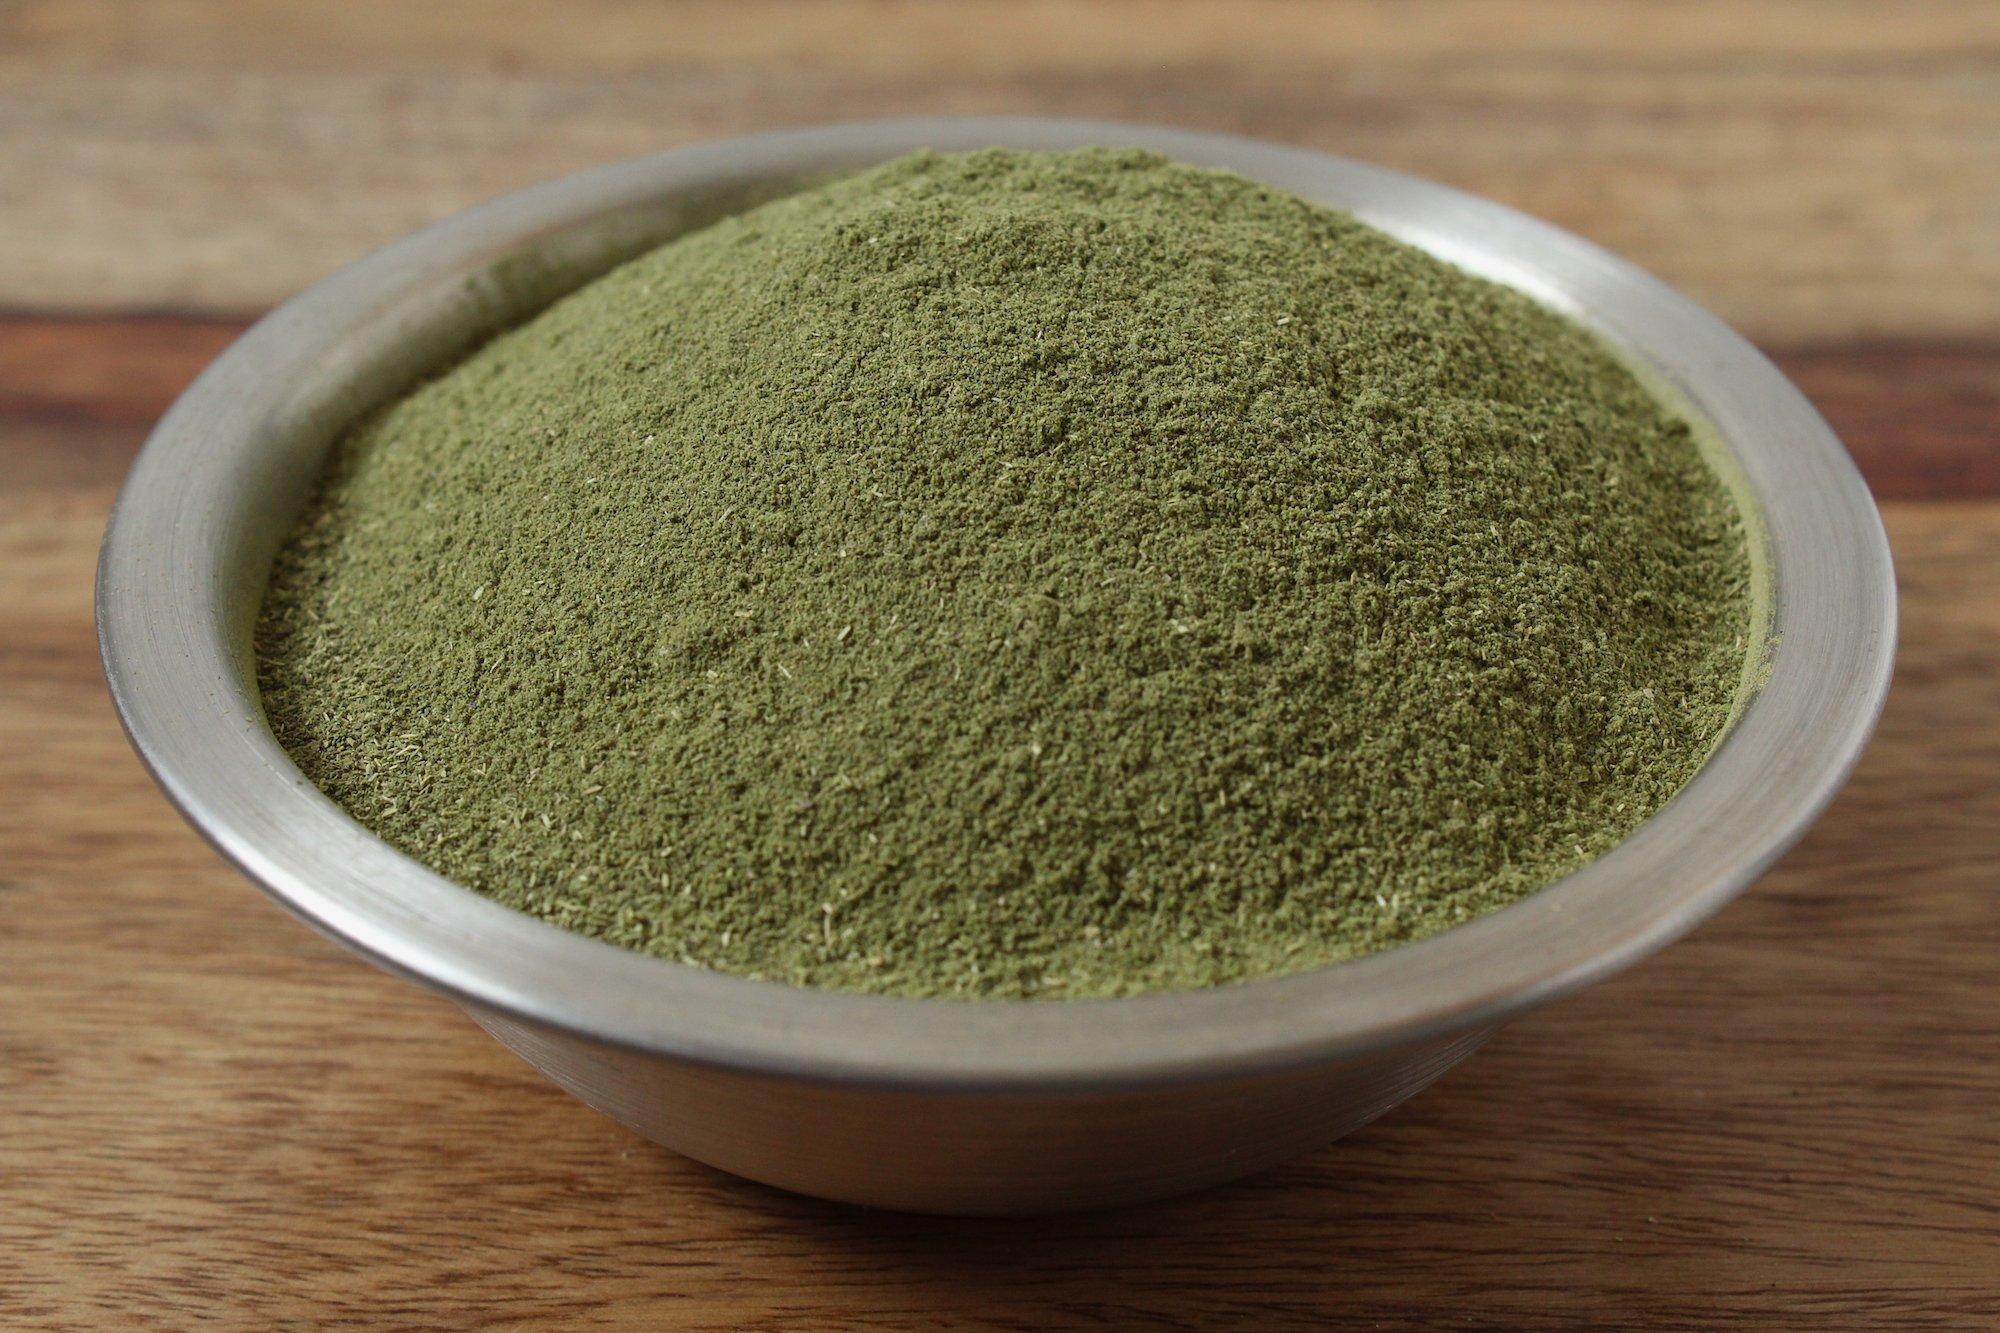 5 lb LiveWell Imports Organic Peppermint Leaf Powder USDA Certified Organic Non GMO (80 oz)